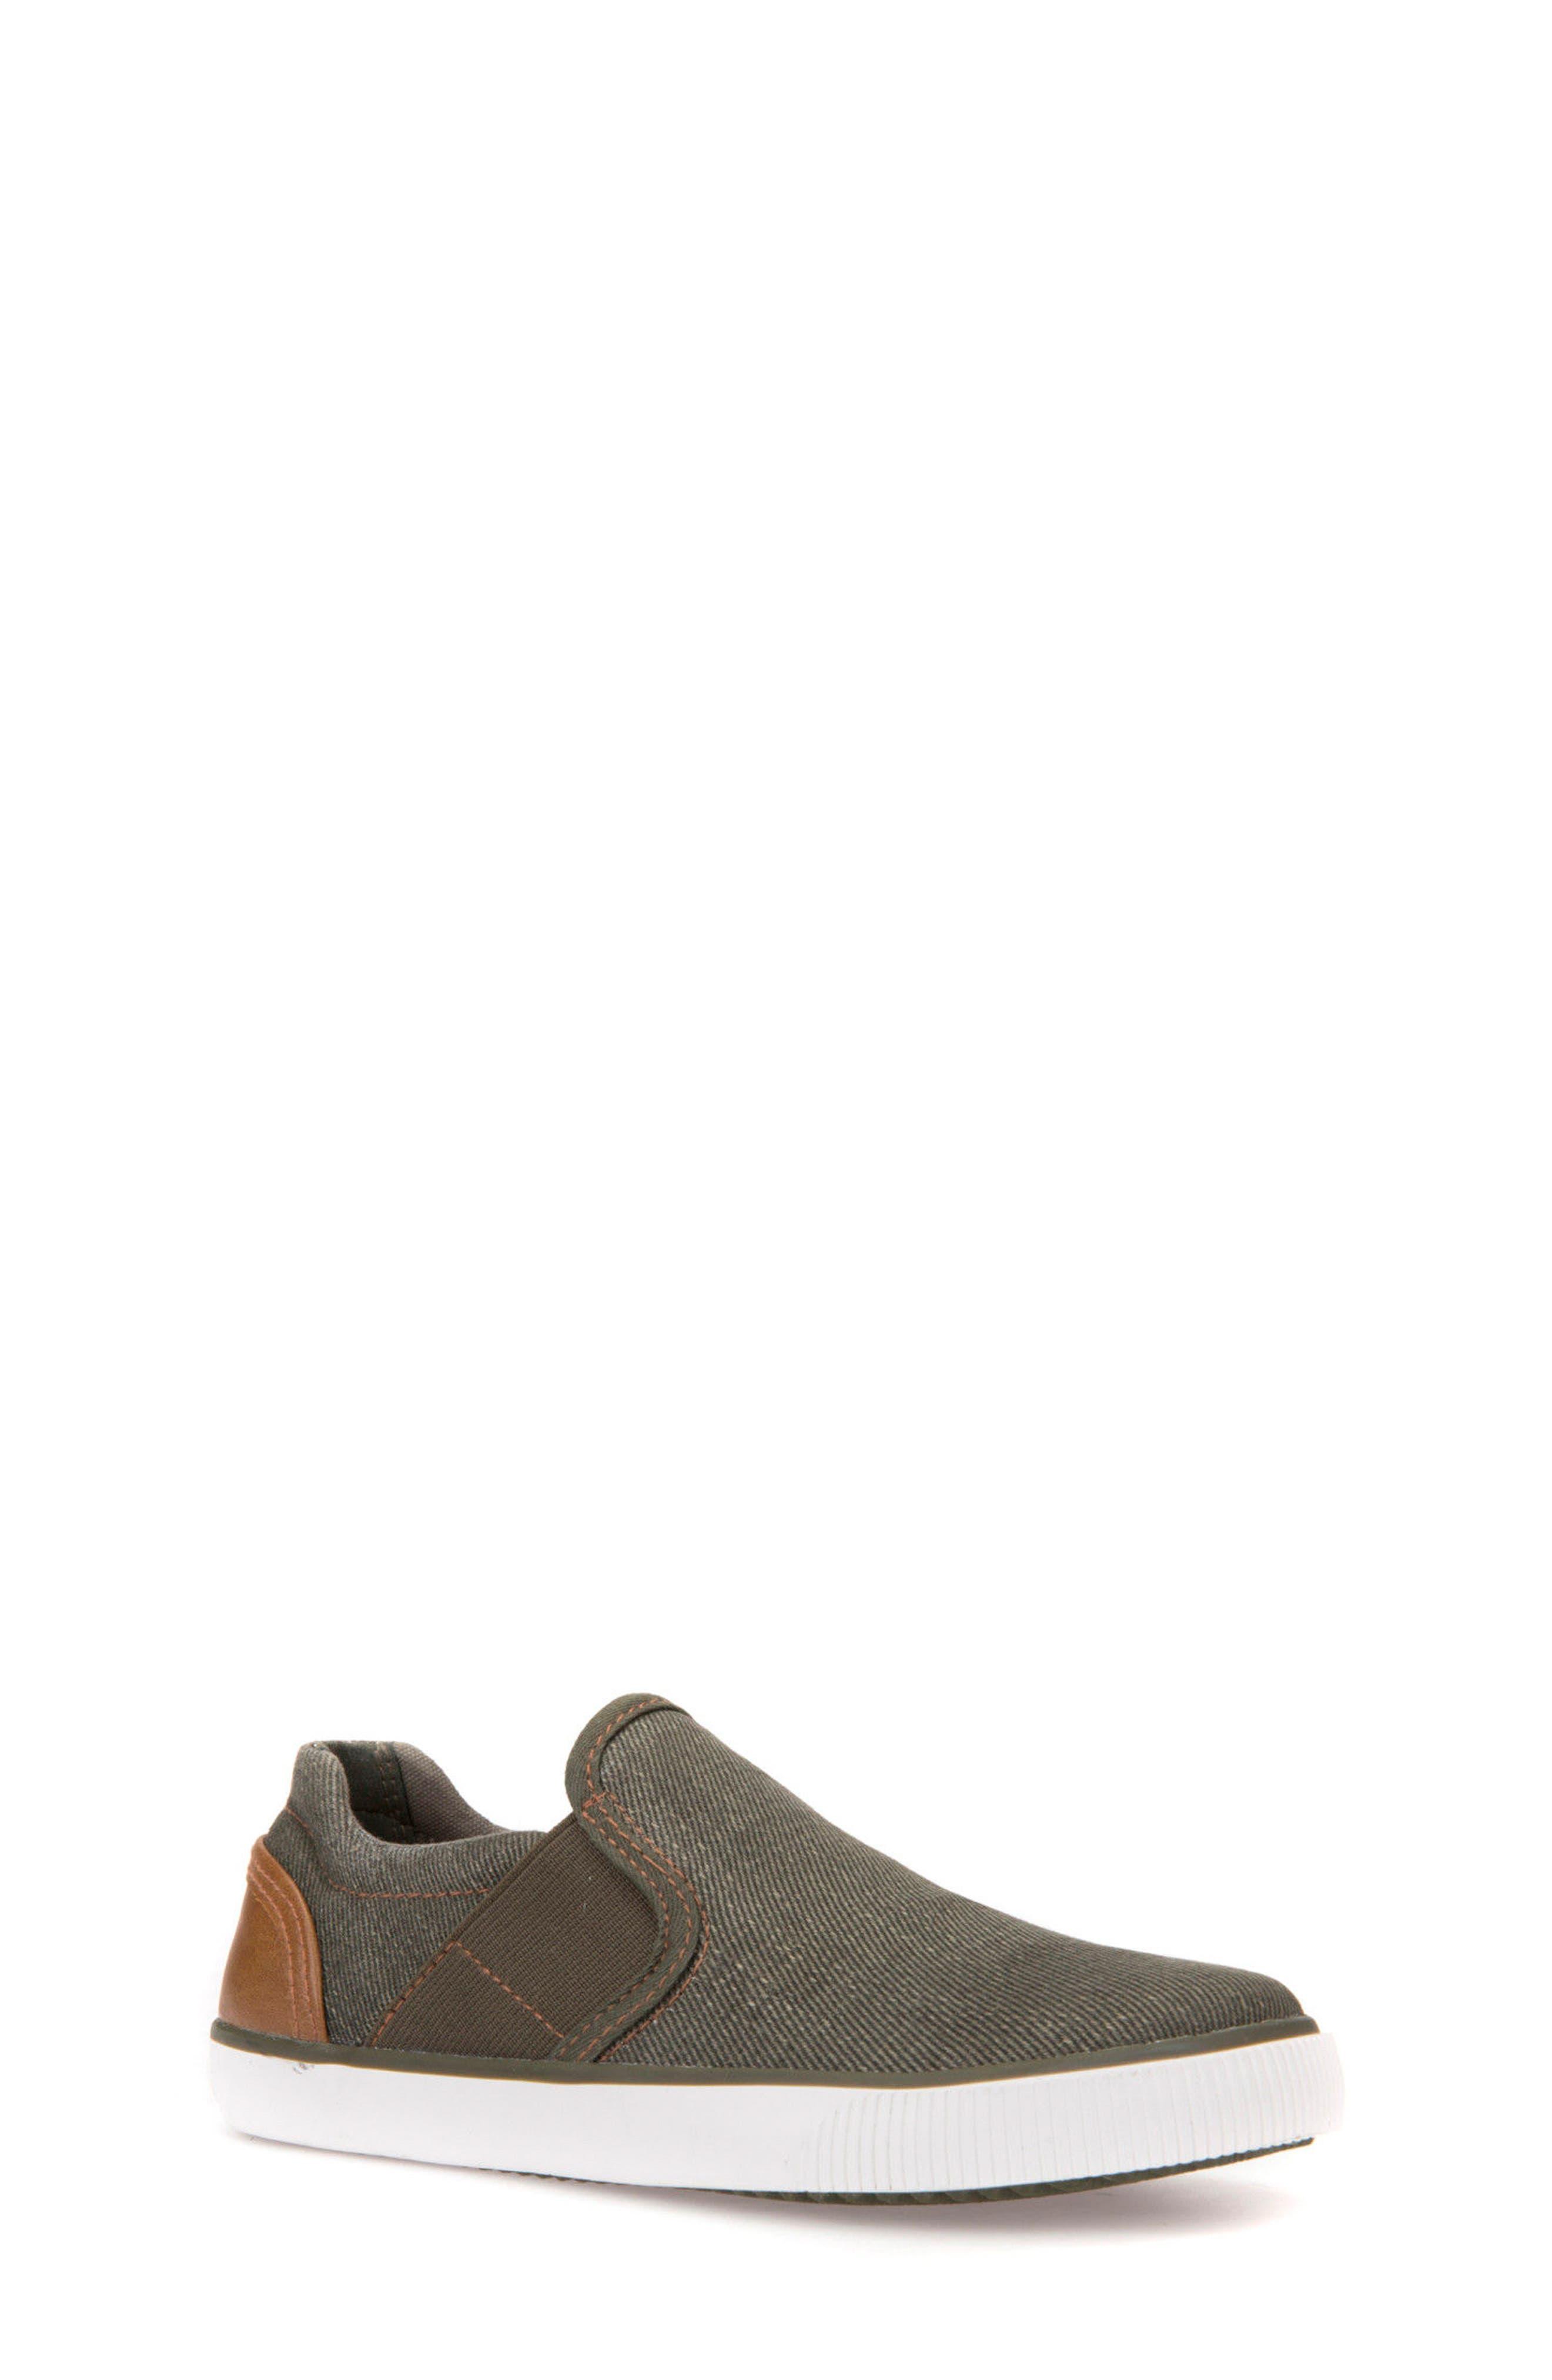 Kilwi Slip-On Sneaker,                             Main thumbnail 1, color,                             Military/ Light Brown